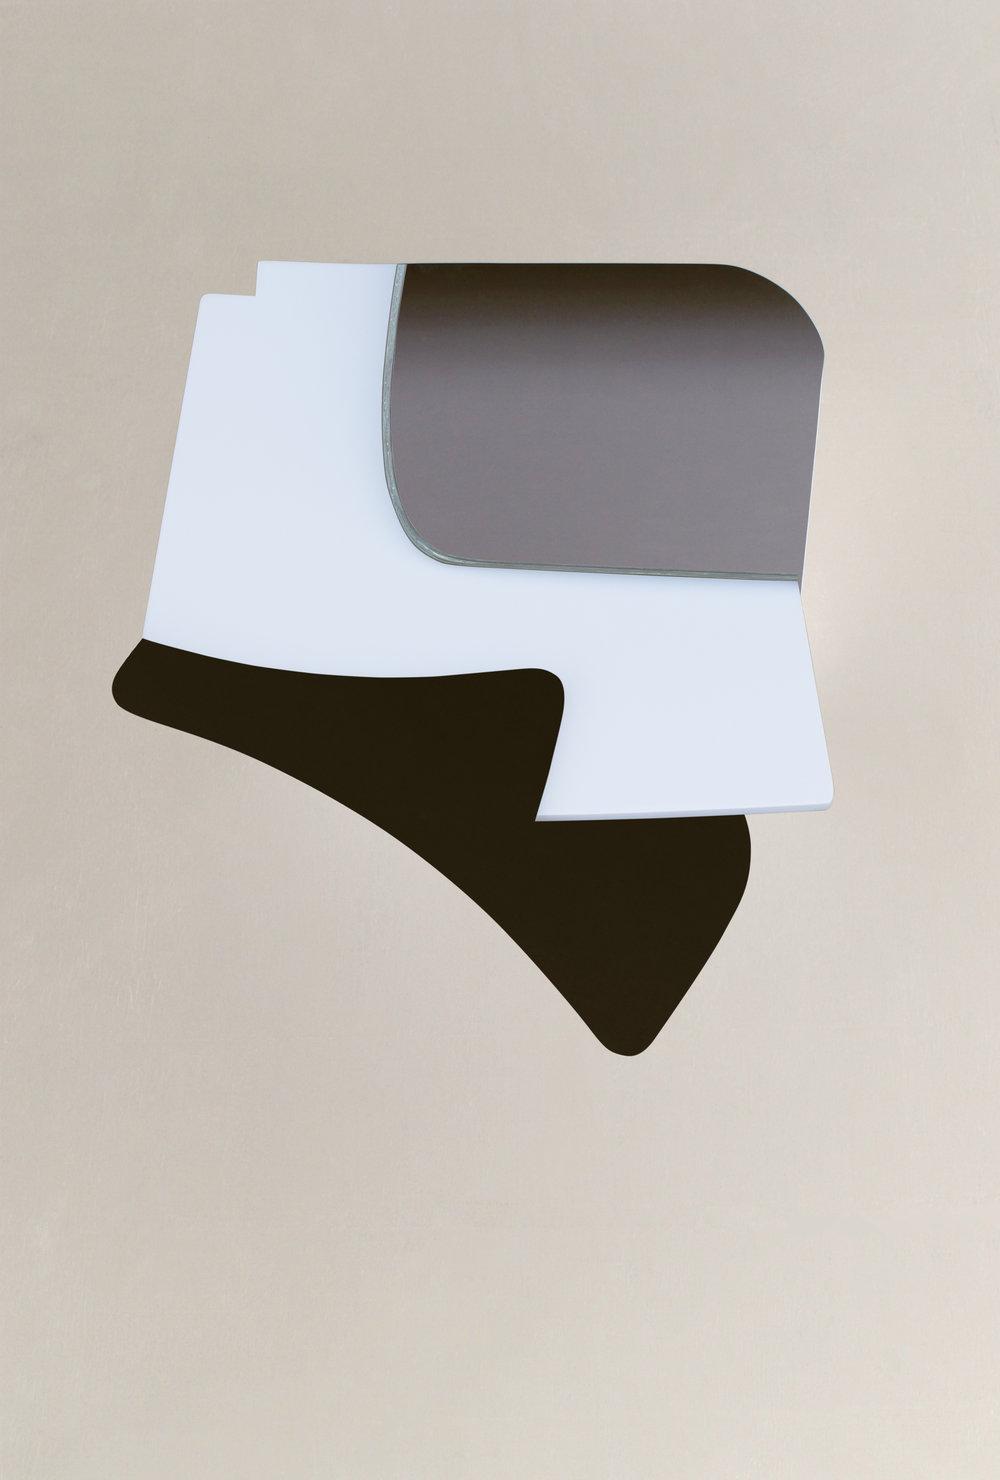 Denis Darzacq,  Contreformes No. 13 , 2017  Digital pigment print, 100 X 67.57 cm (39.37 × 26.6 in), edition of 5   Inquire